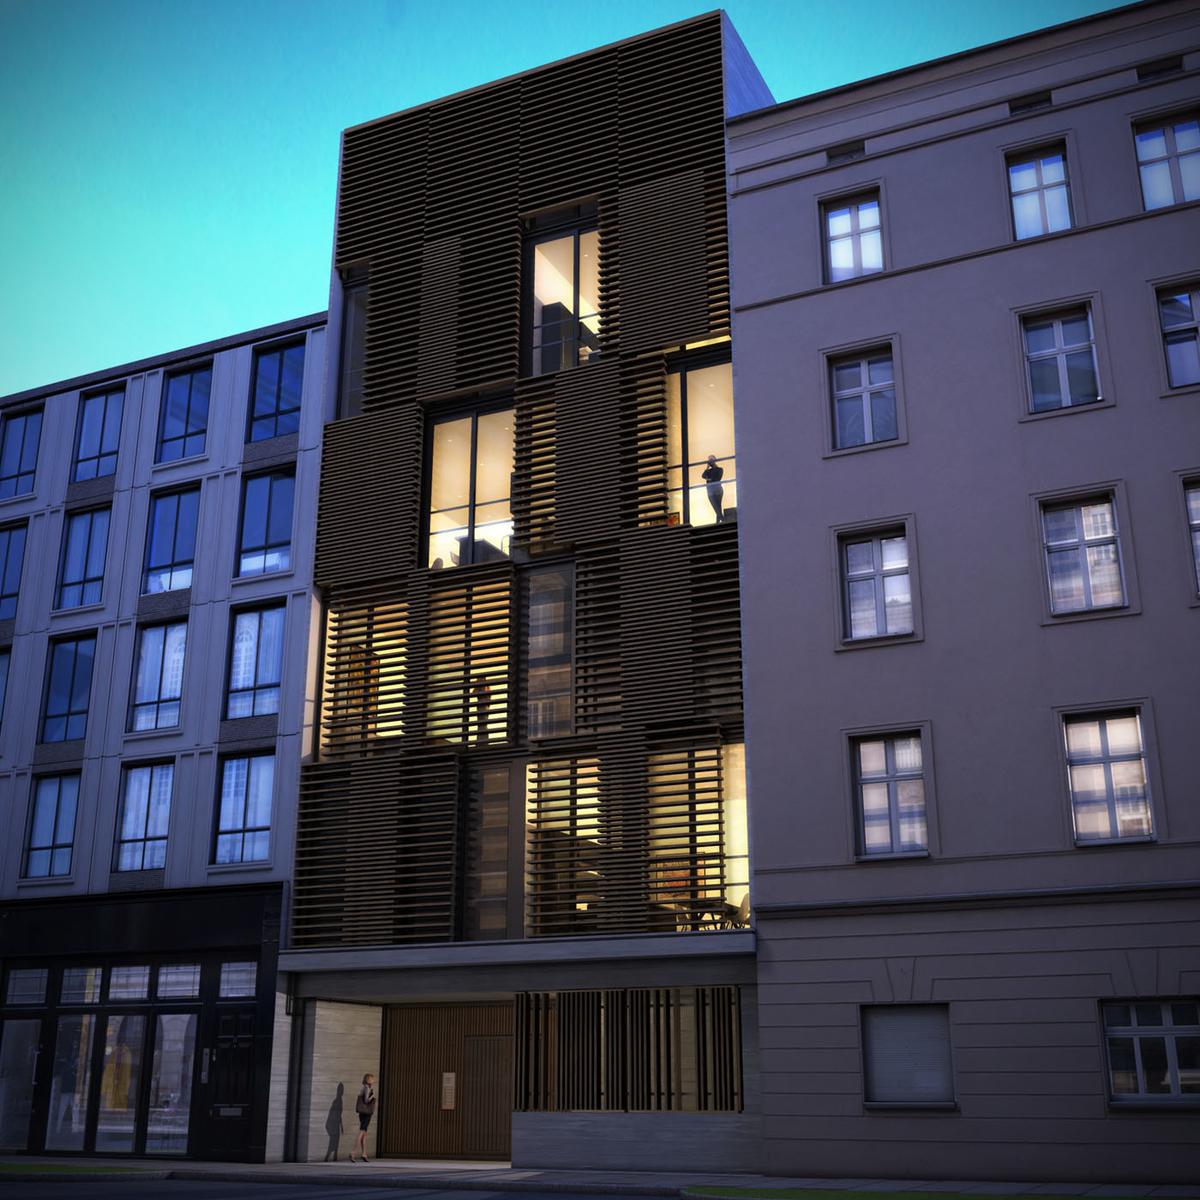 Apartment Block: Mx-Visualisation London Based 3D Computer